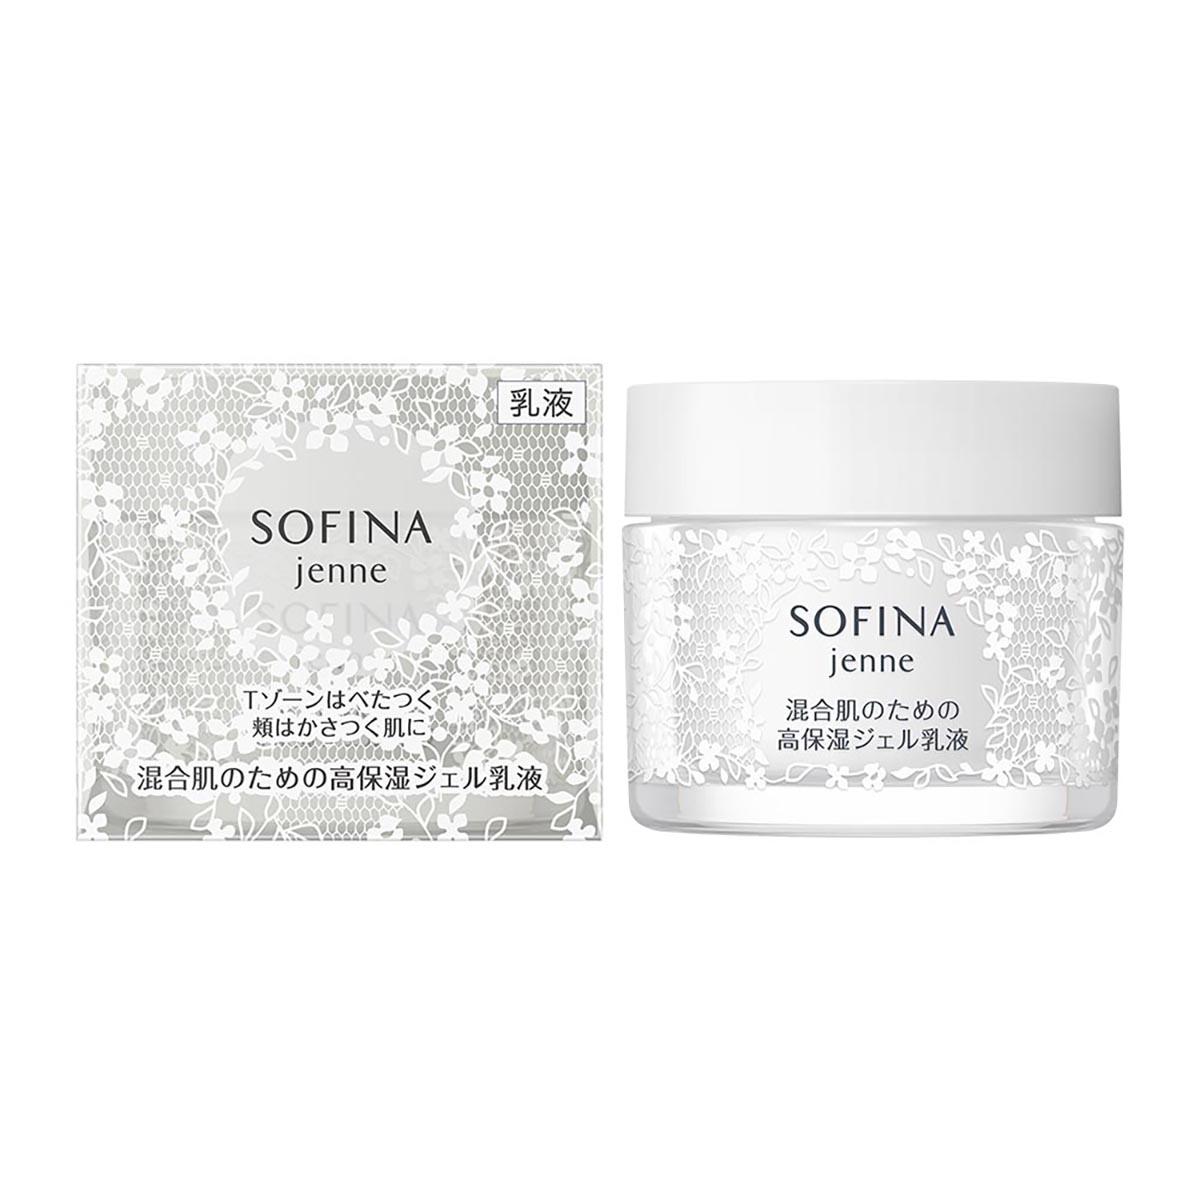 SOFINA蘇菲娜 透美顏控油水凝乳液50g【康是美】